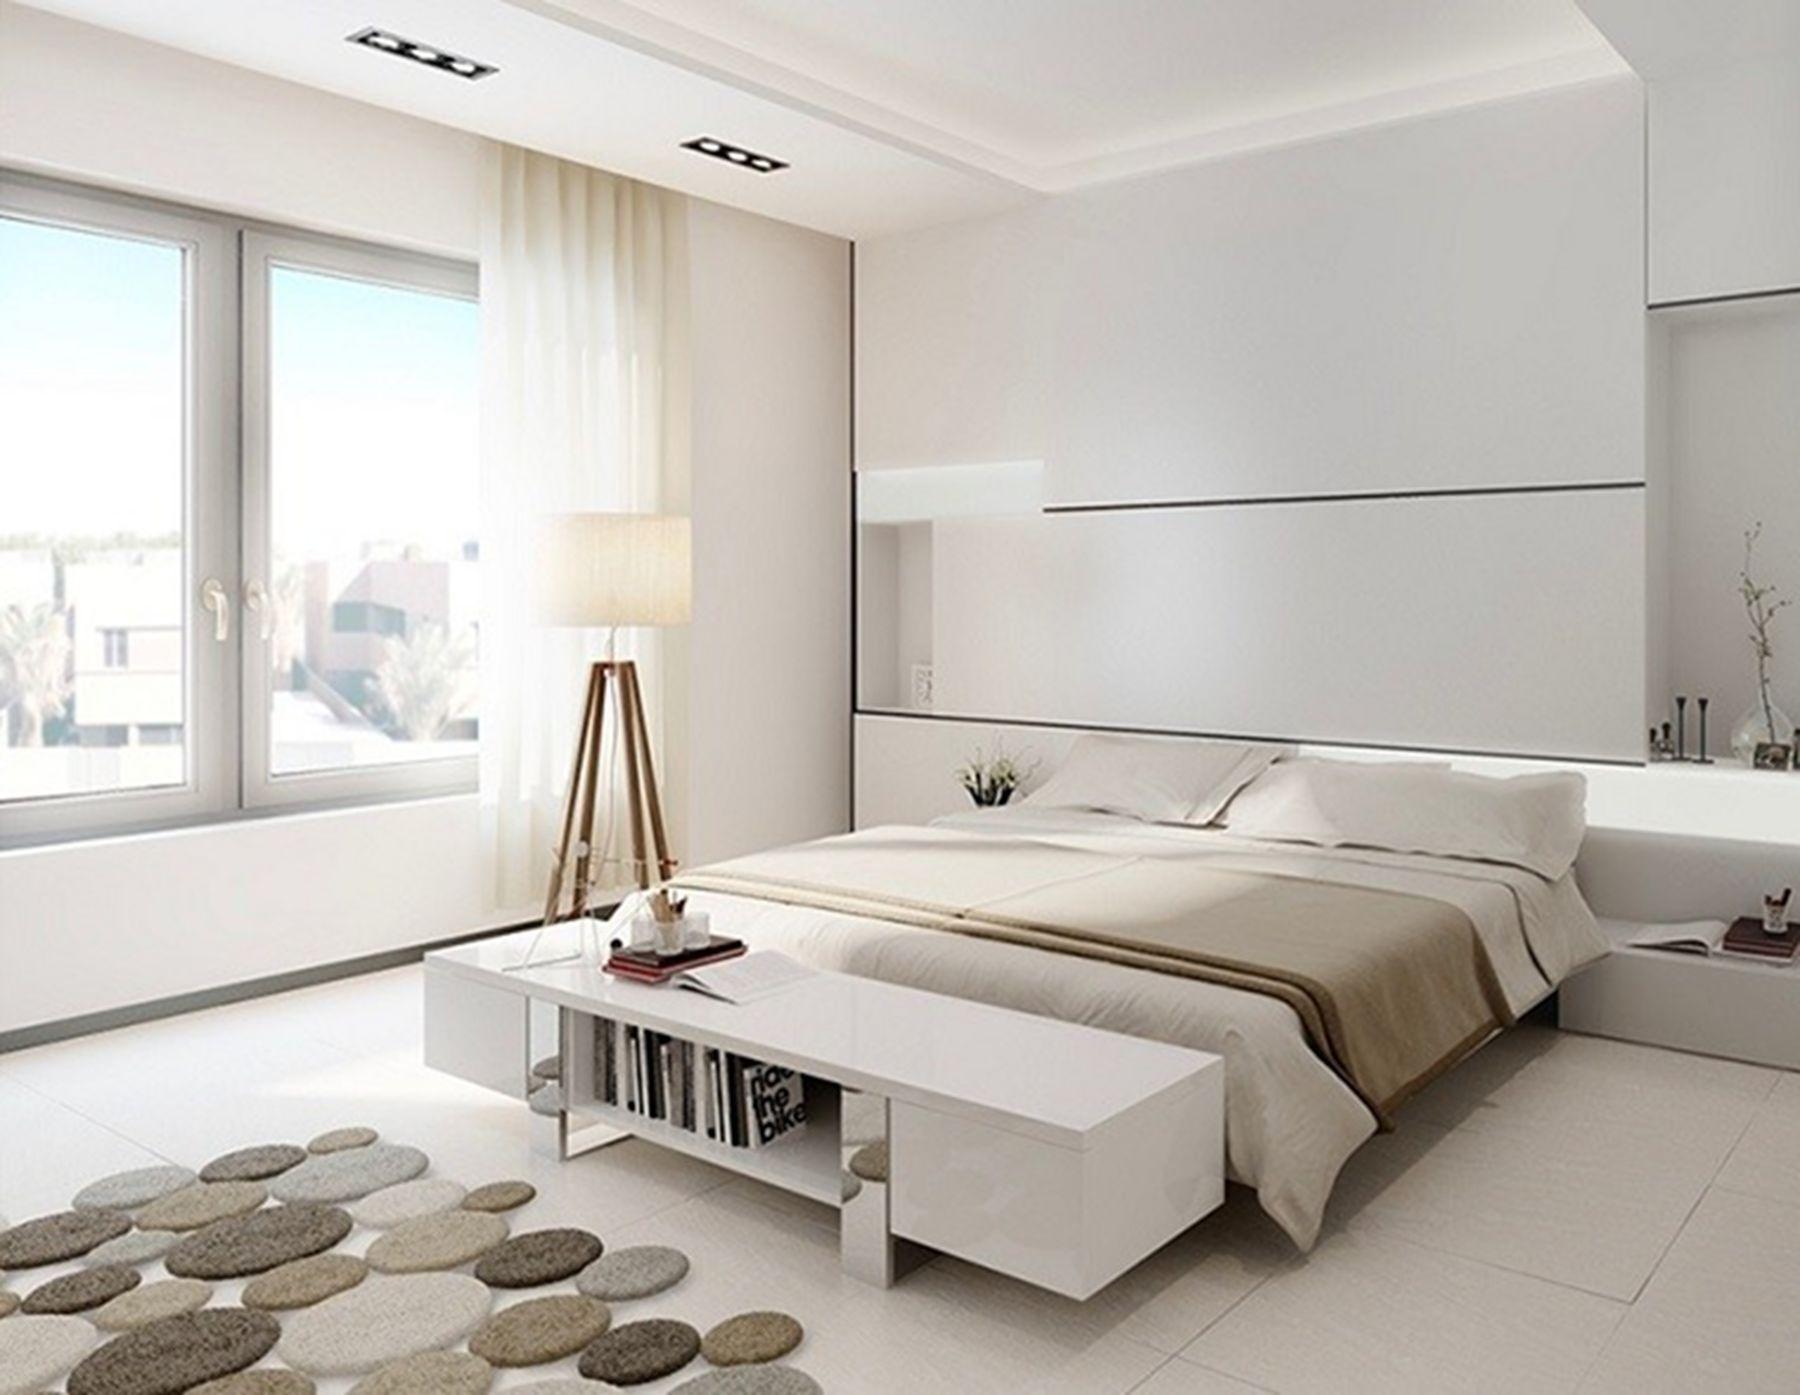 Decorating master bedroom minimalist style | White bedroom ...